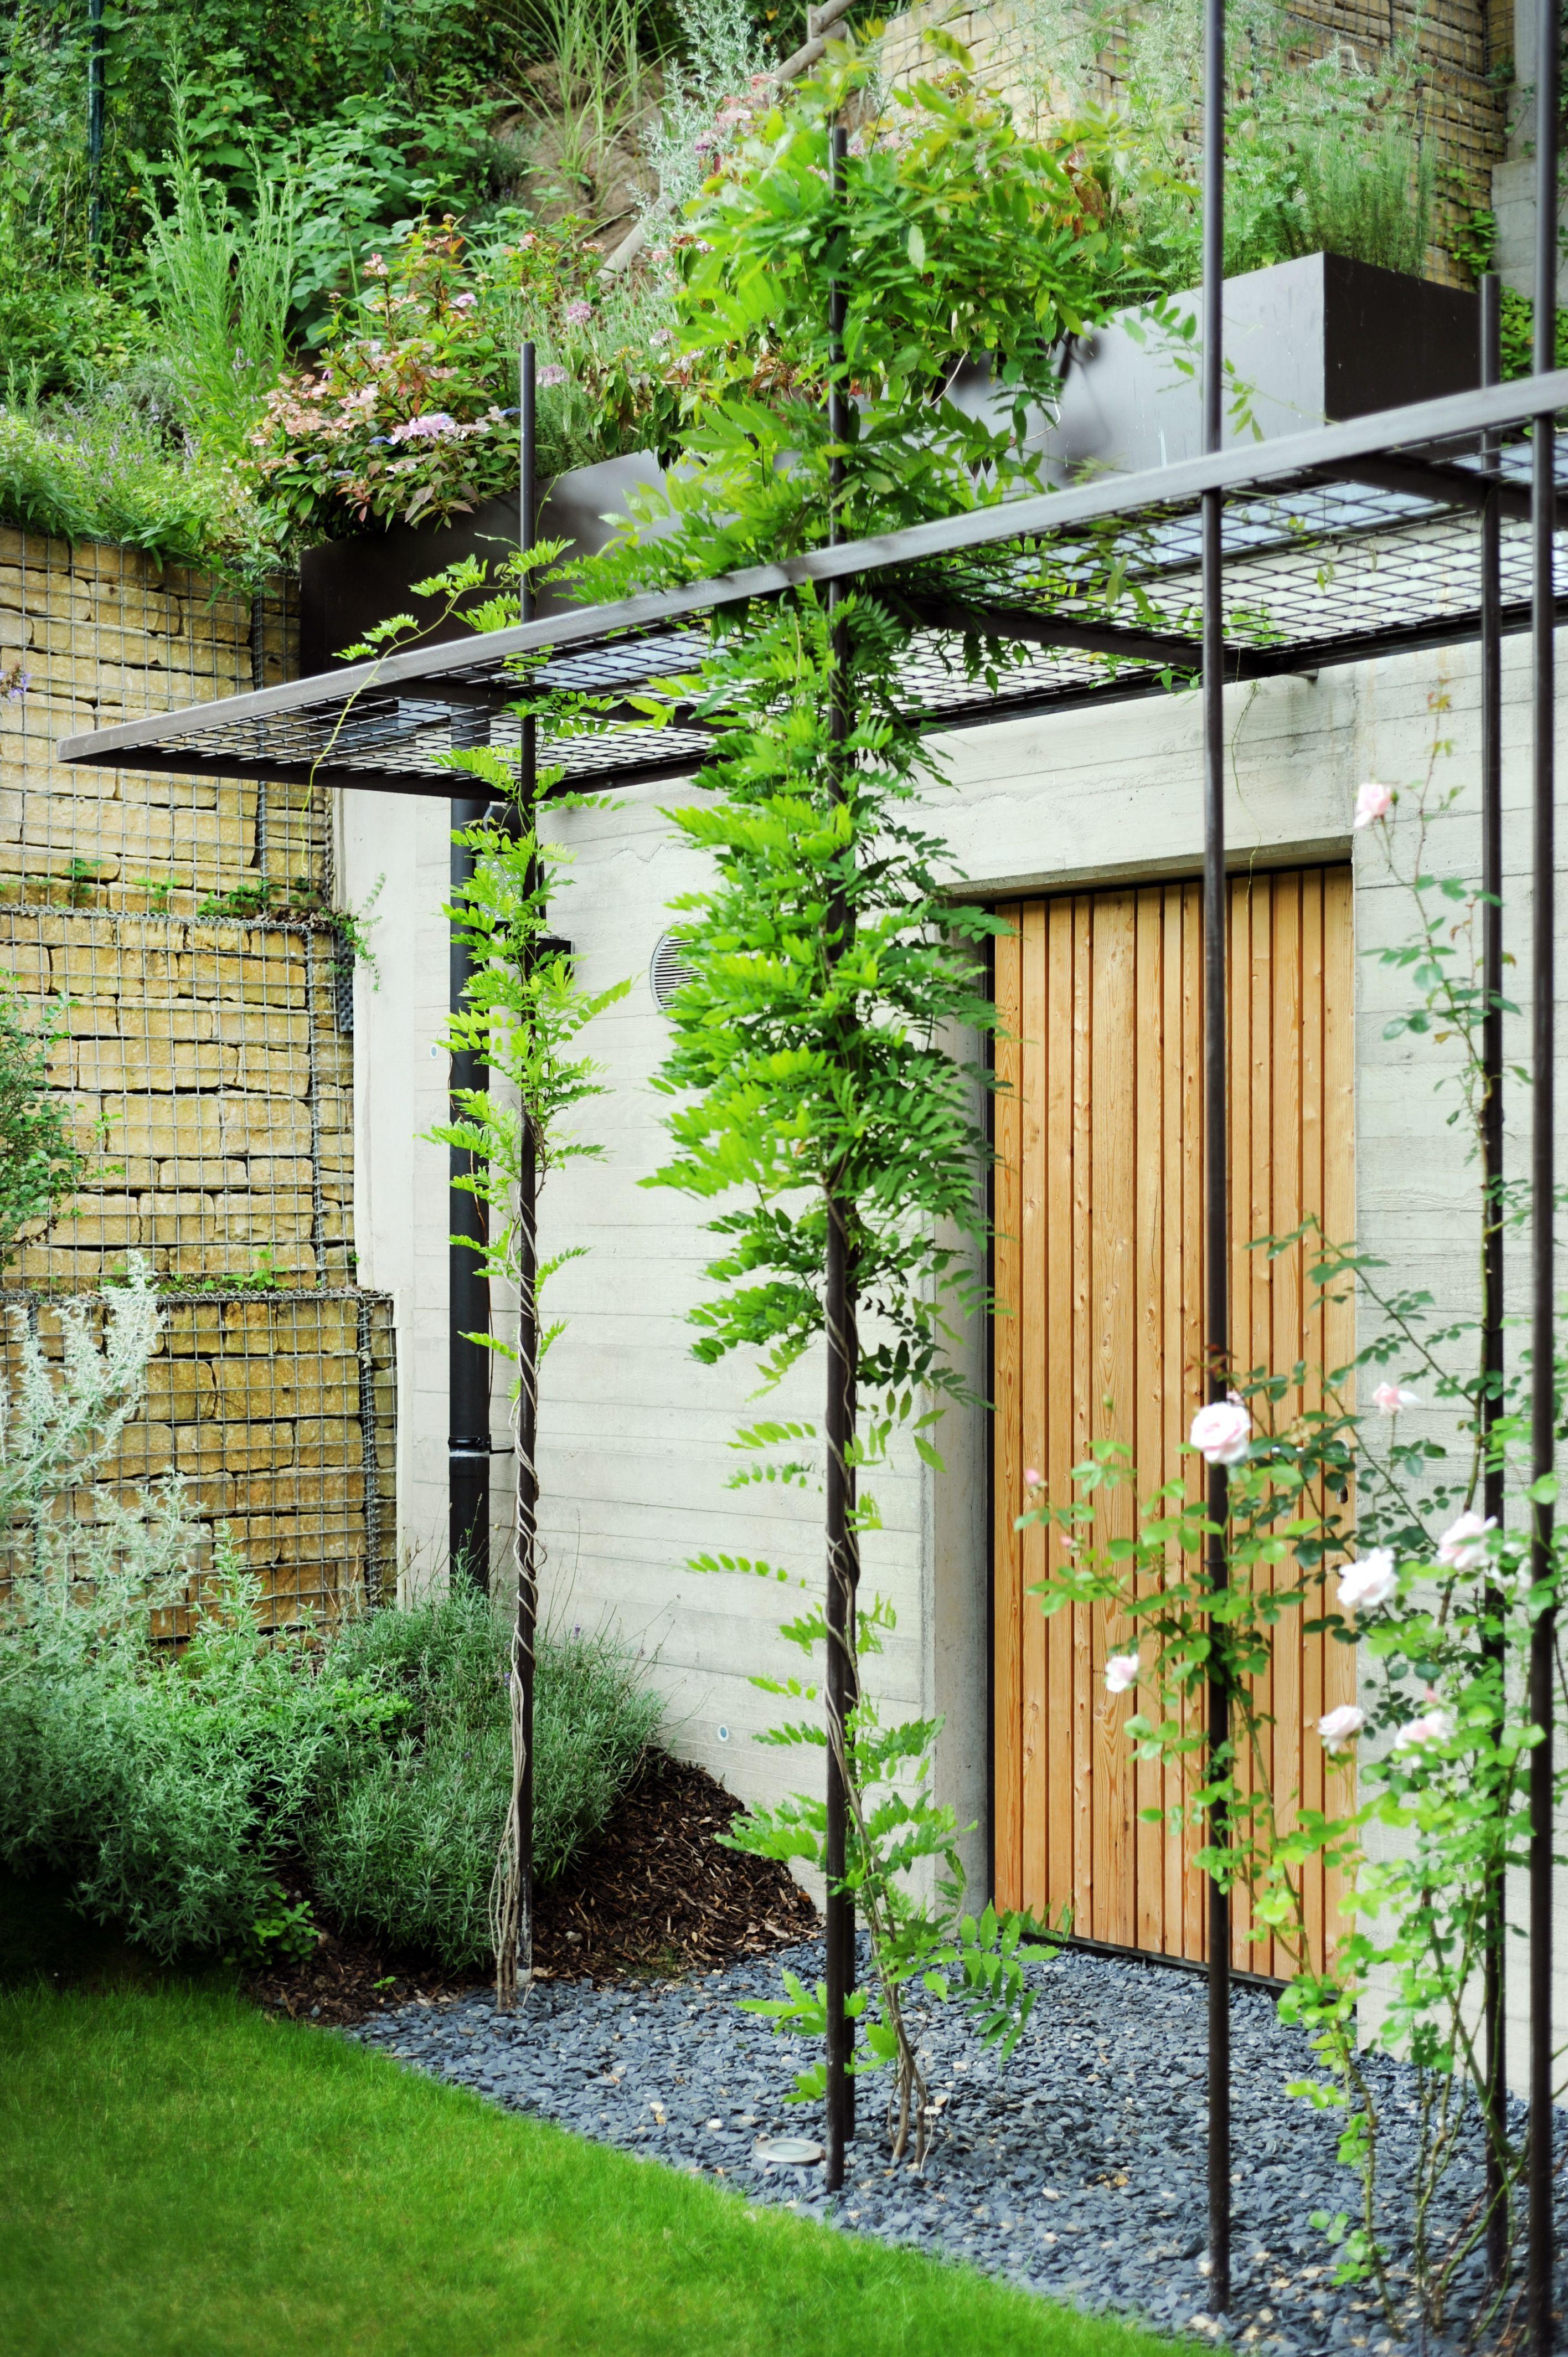 Jardin privé conception pergola acier et plantation vereal arch www moreno lu